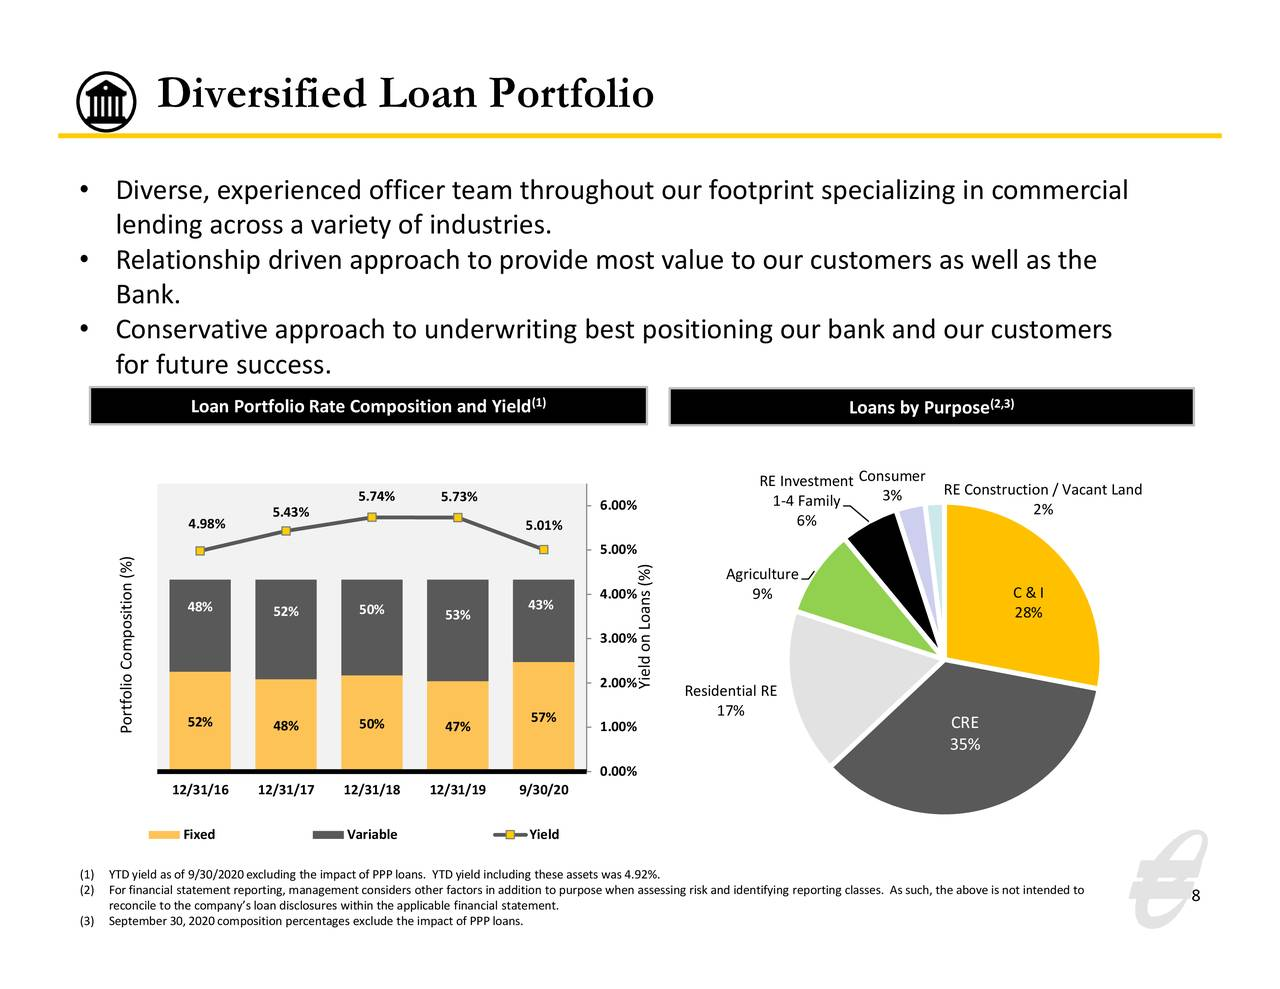 Cartera de préstamos diversificada